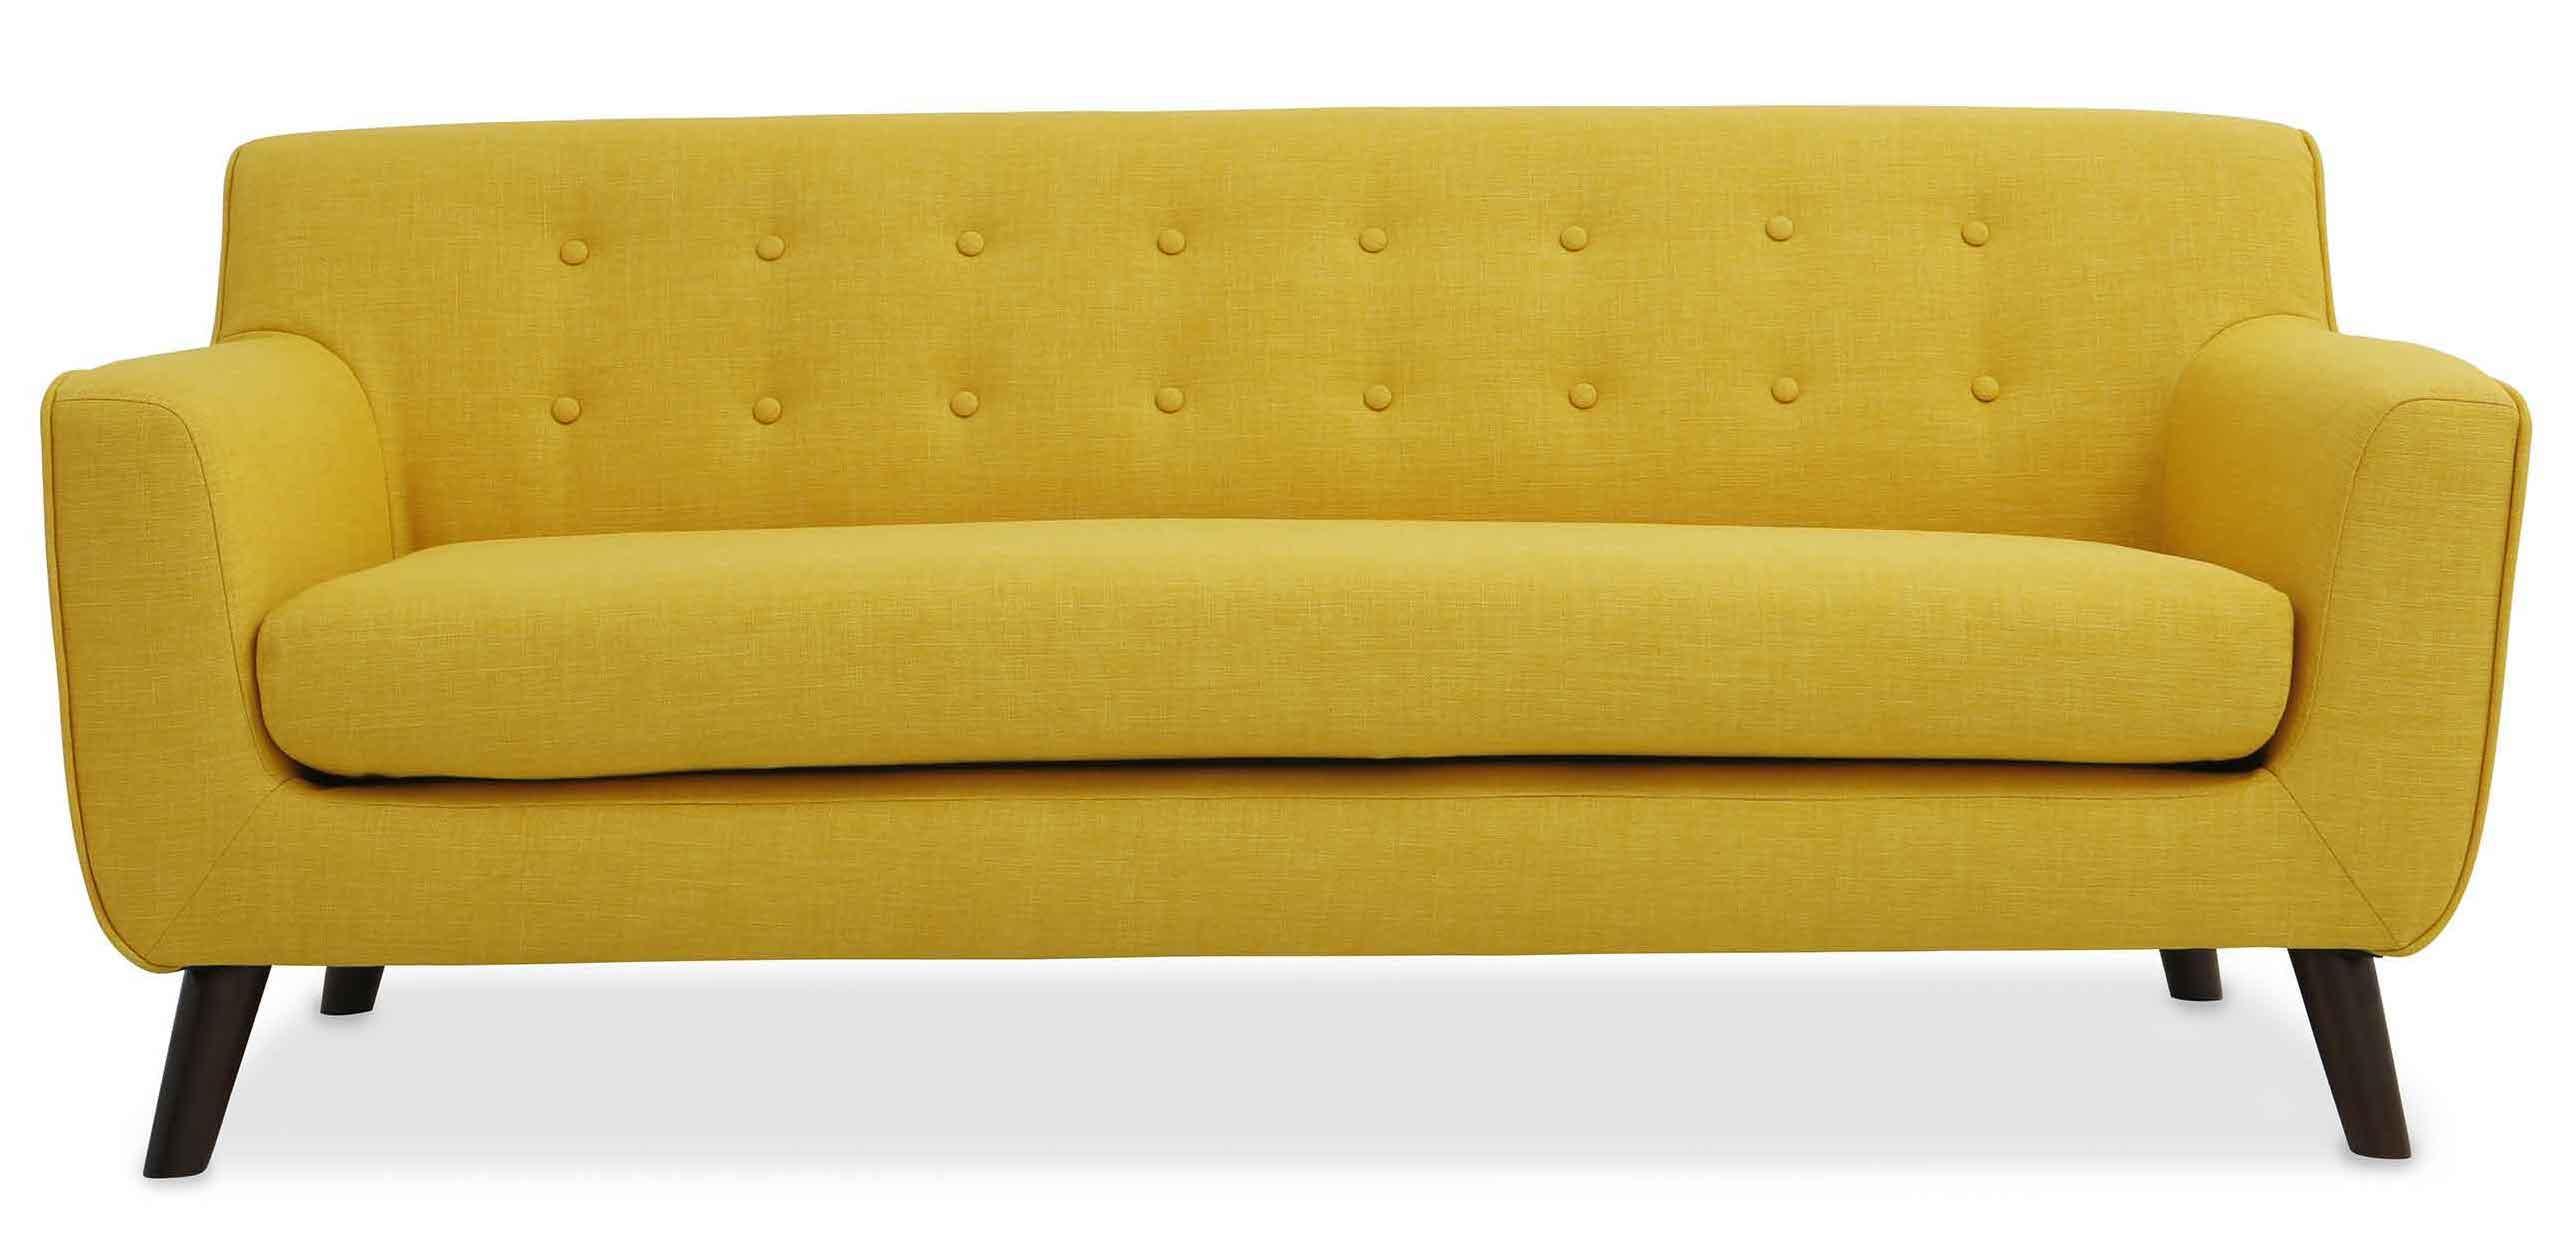 canap jaune capitonn 2 places katy. Black Bedroom Furniture Sets. Home Design Ideas